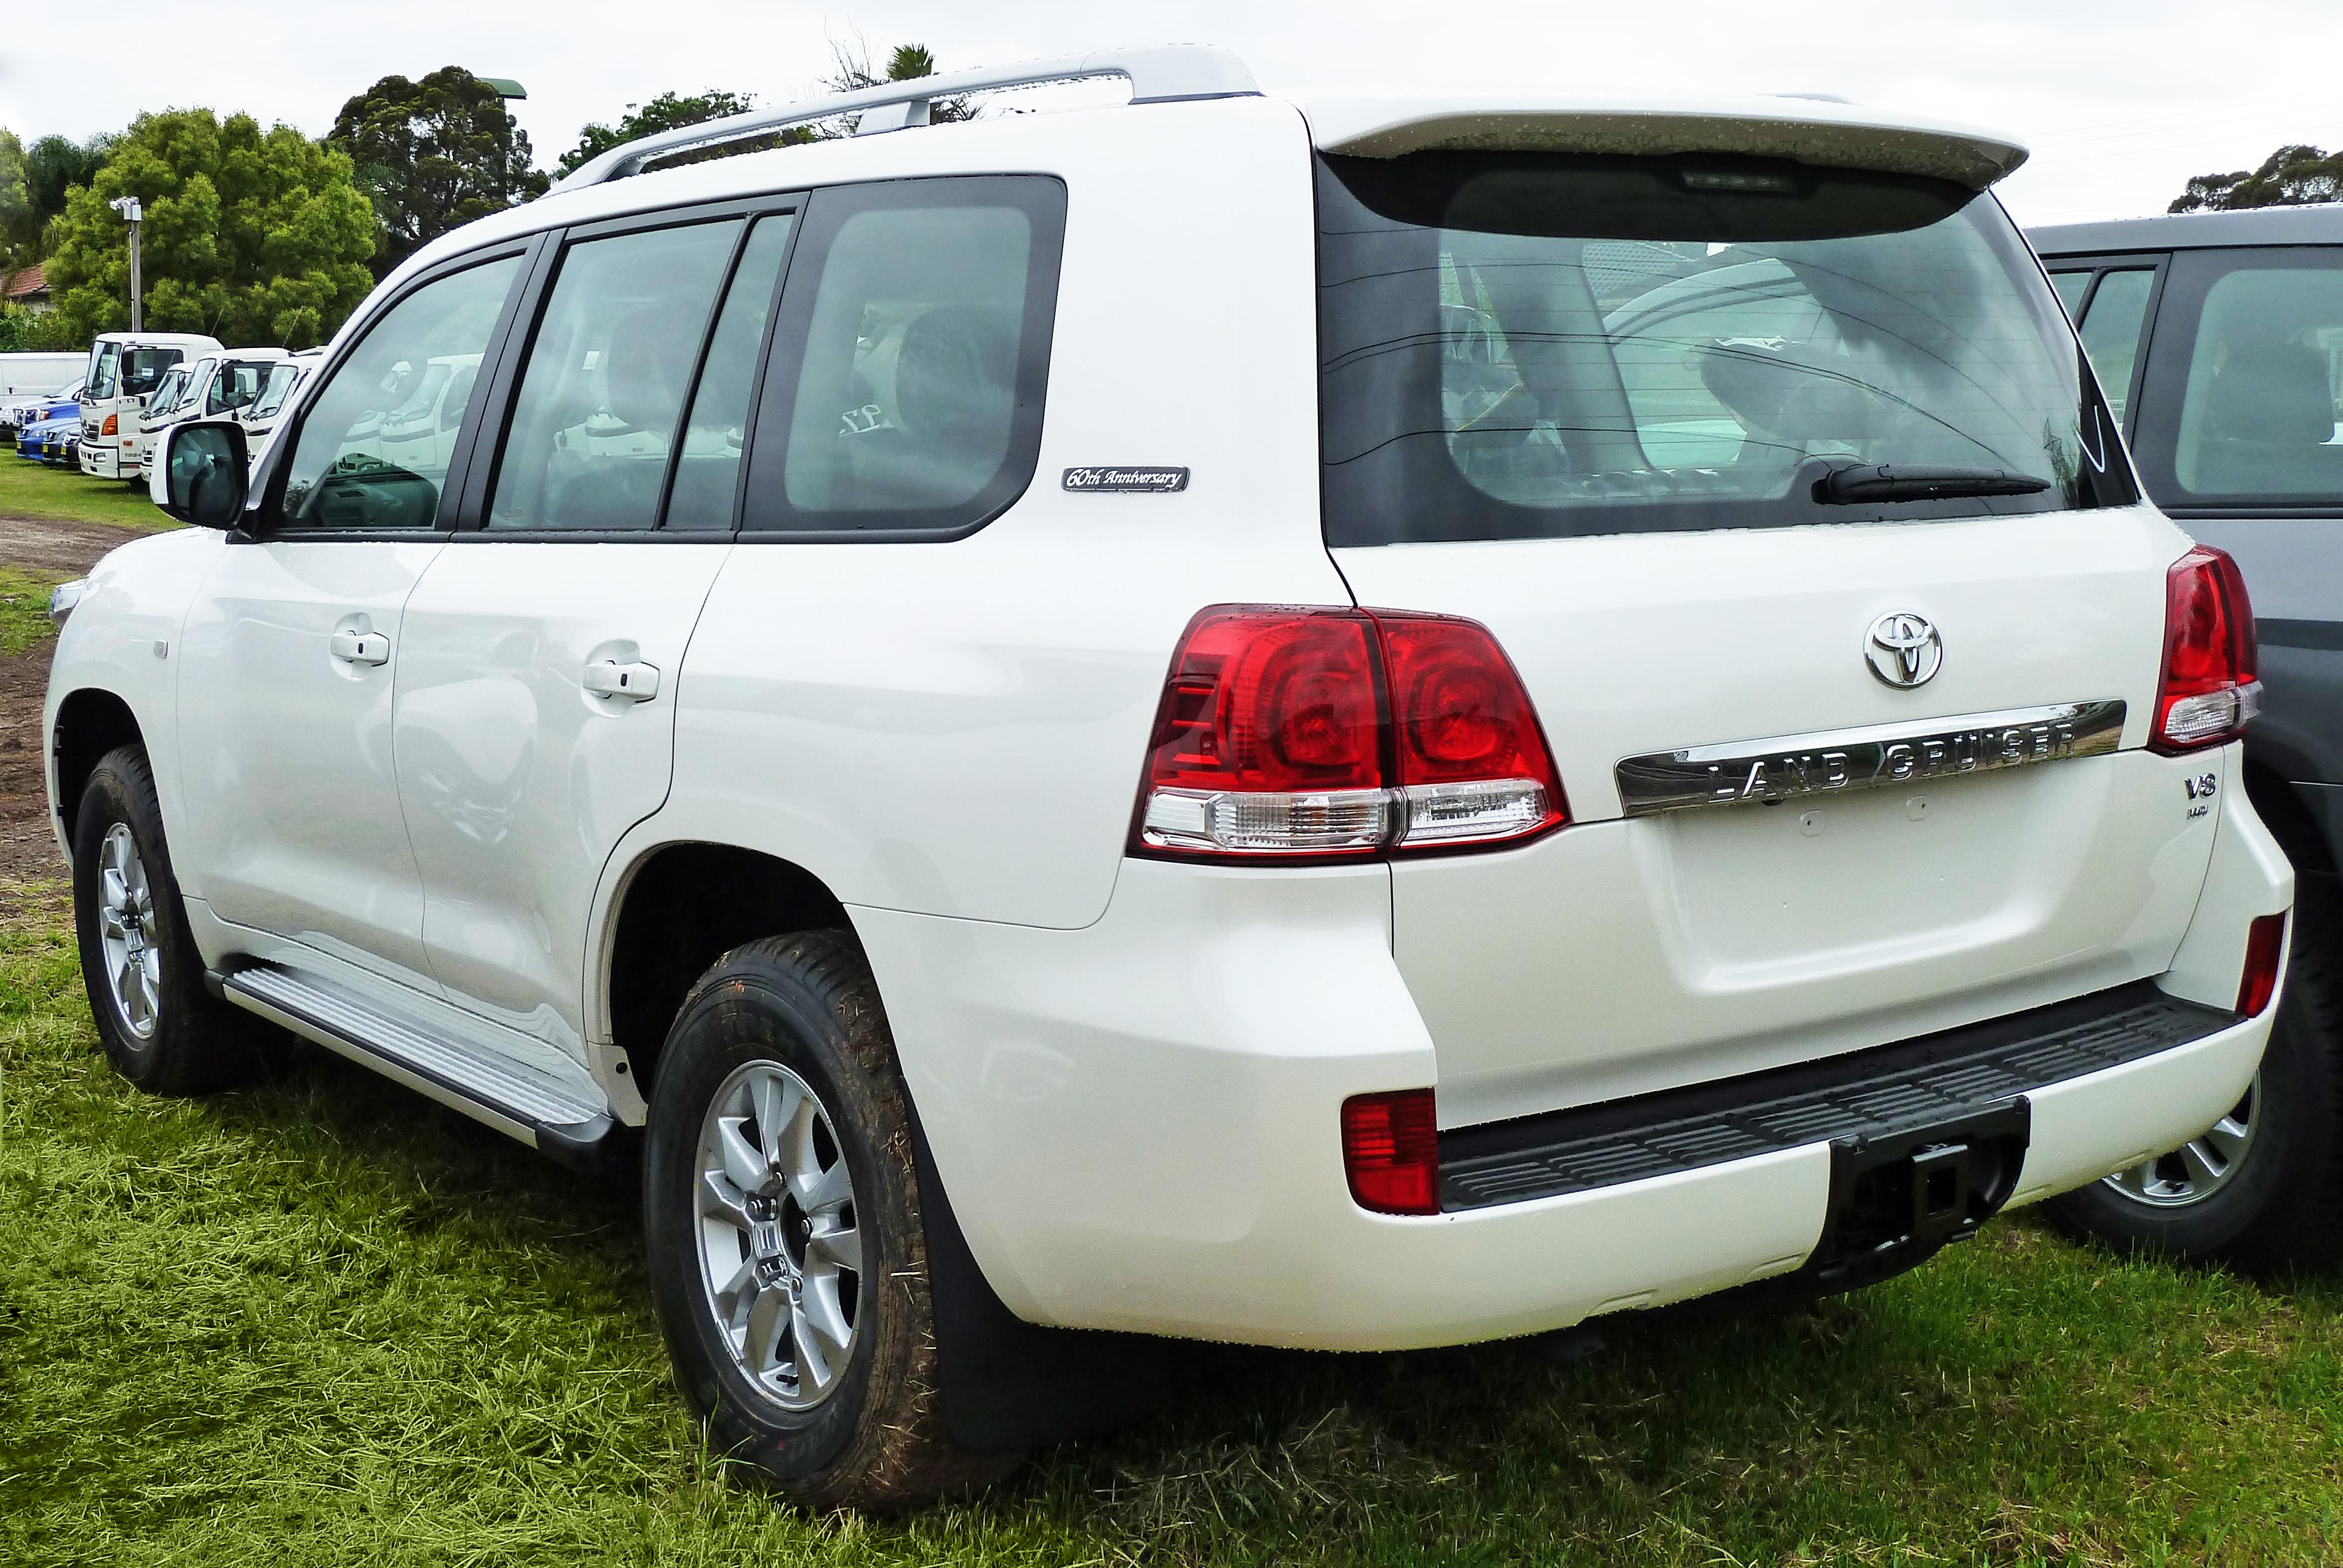 File:2010 Toyota Land Cruiser (UZJ200R) 60th Anniversary Wagon (2010 10